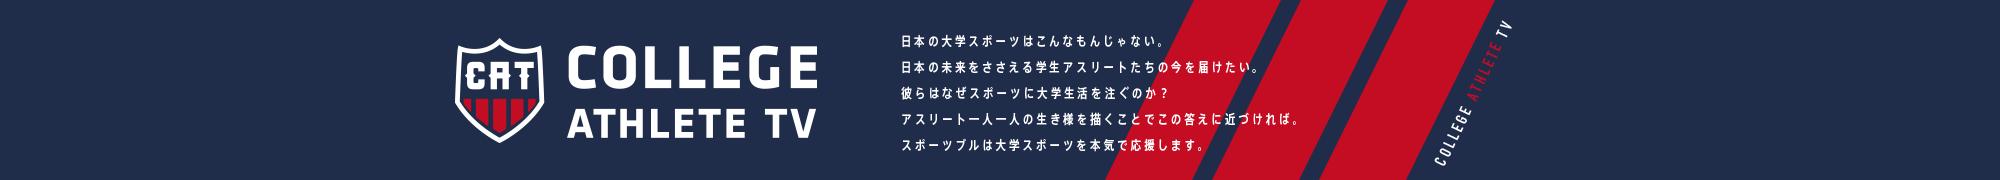 TEAM123456789計法 大0001000001早 大0000000000(早)●早川、今西―小藤◇(二塁打)蛭間 厳しい船出となった。ついに開幕を迎えた東京六大学秋季リーグ…